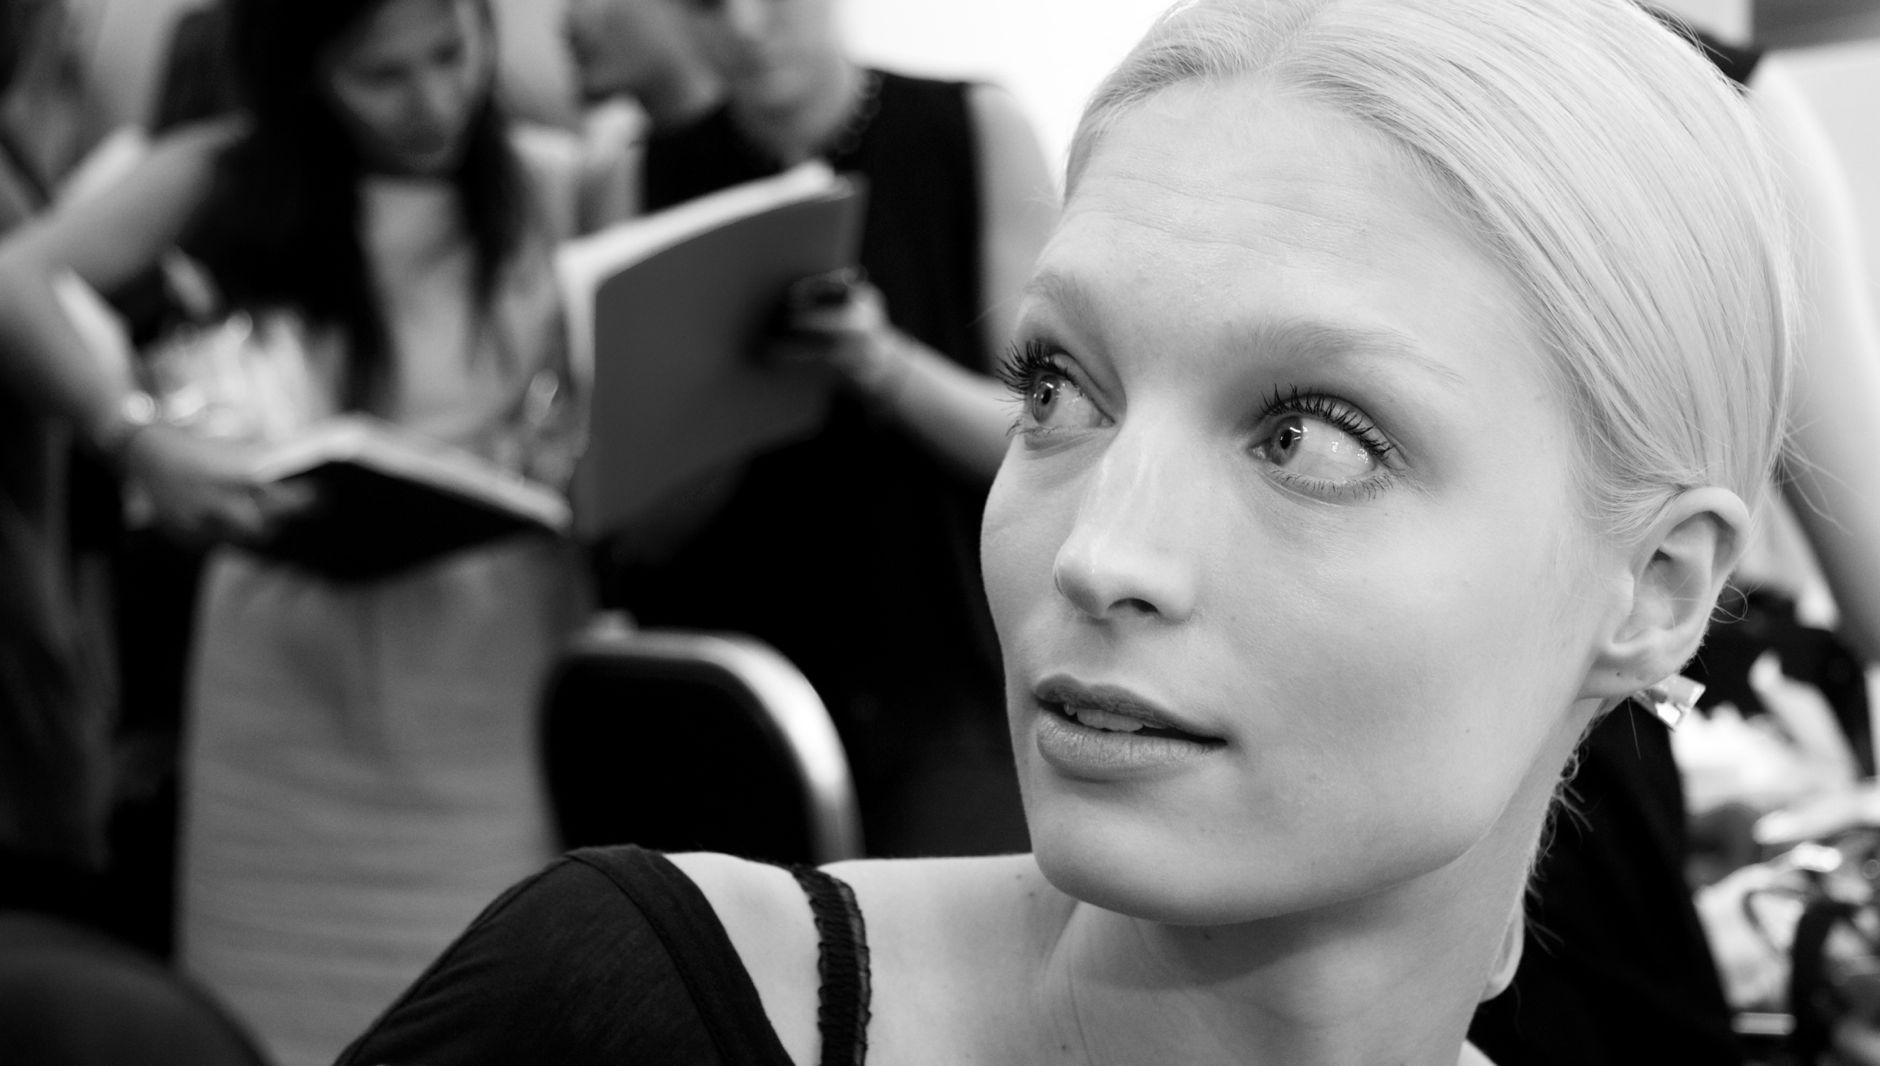 Backstage Iceberg Fashion Woman